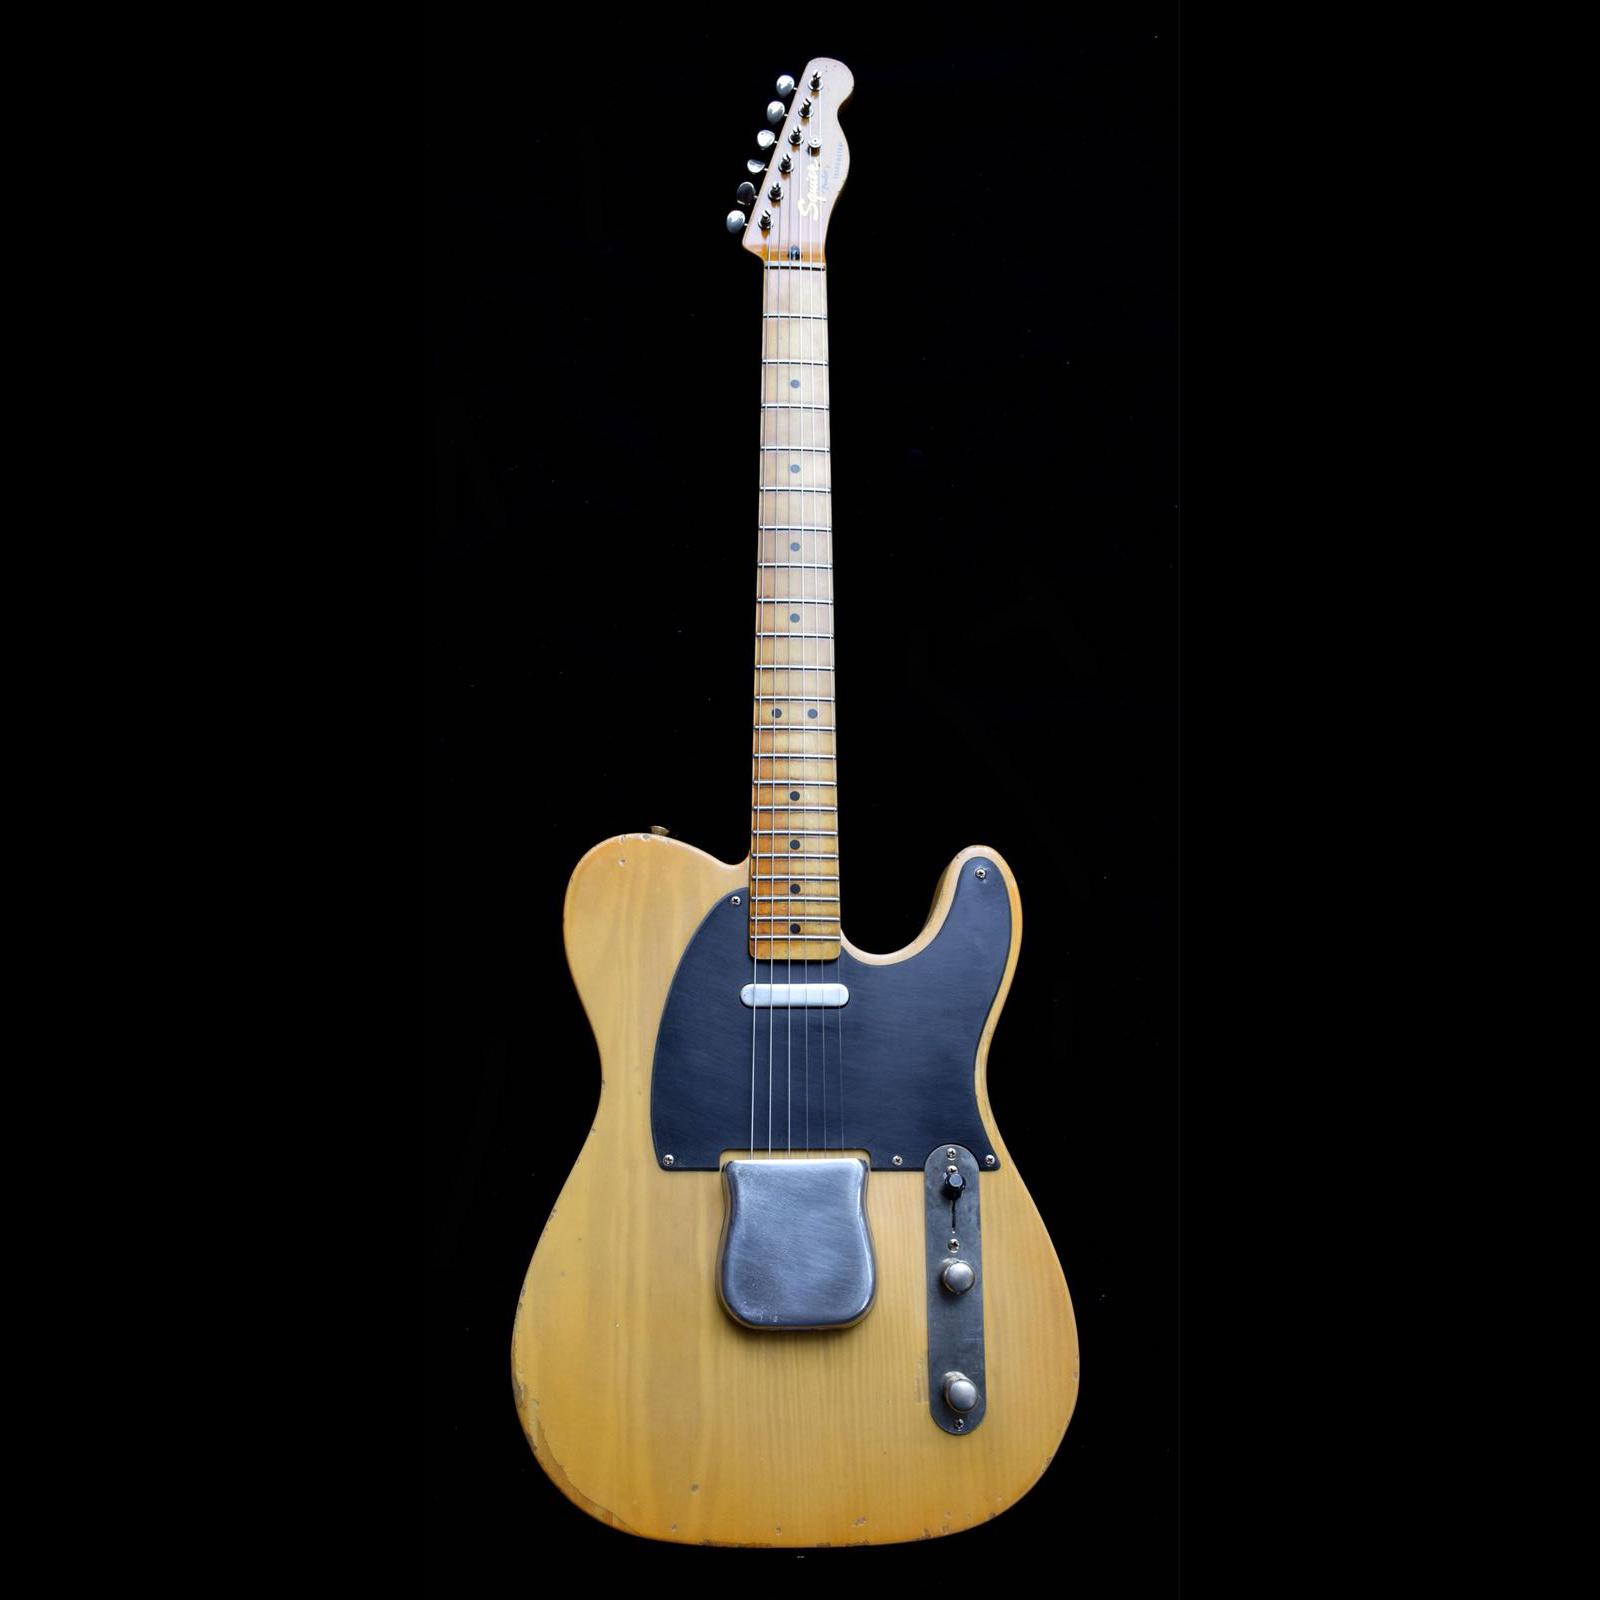 squier classic vibe 50s telecaster custom relic guitar repair nyc. Black Bedroom Furniture Sets. Home Design Ideas